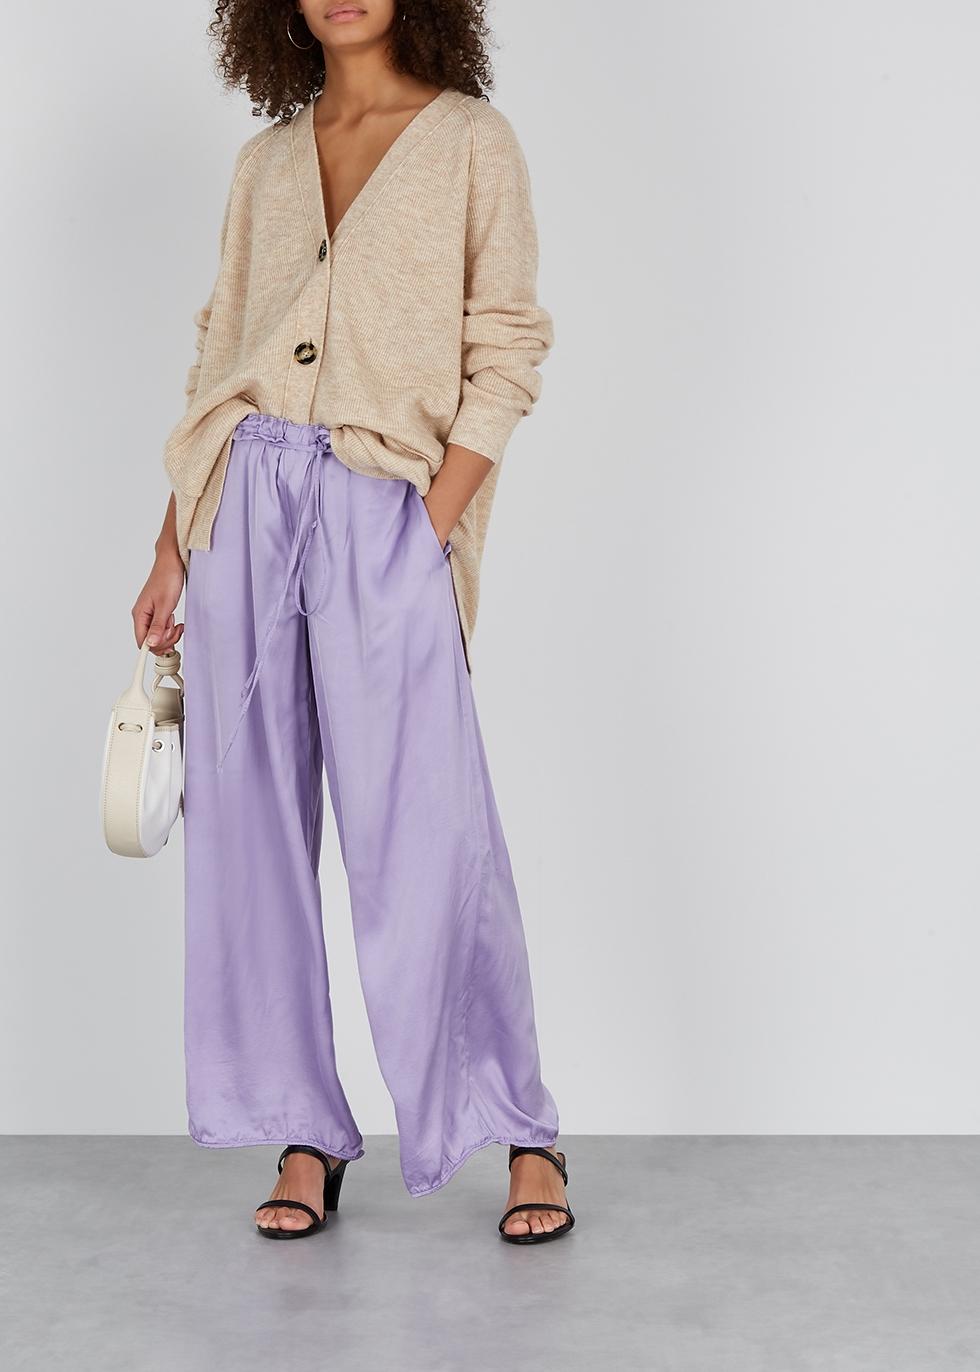 Lilac wide-leg satin trousers - RAQUEL ALLEGRA